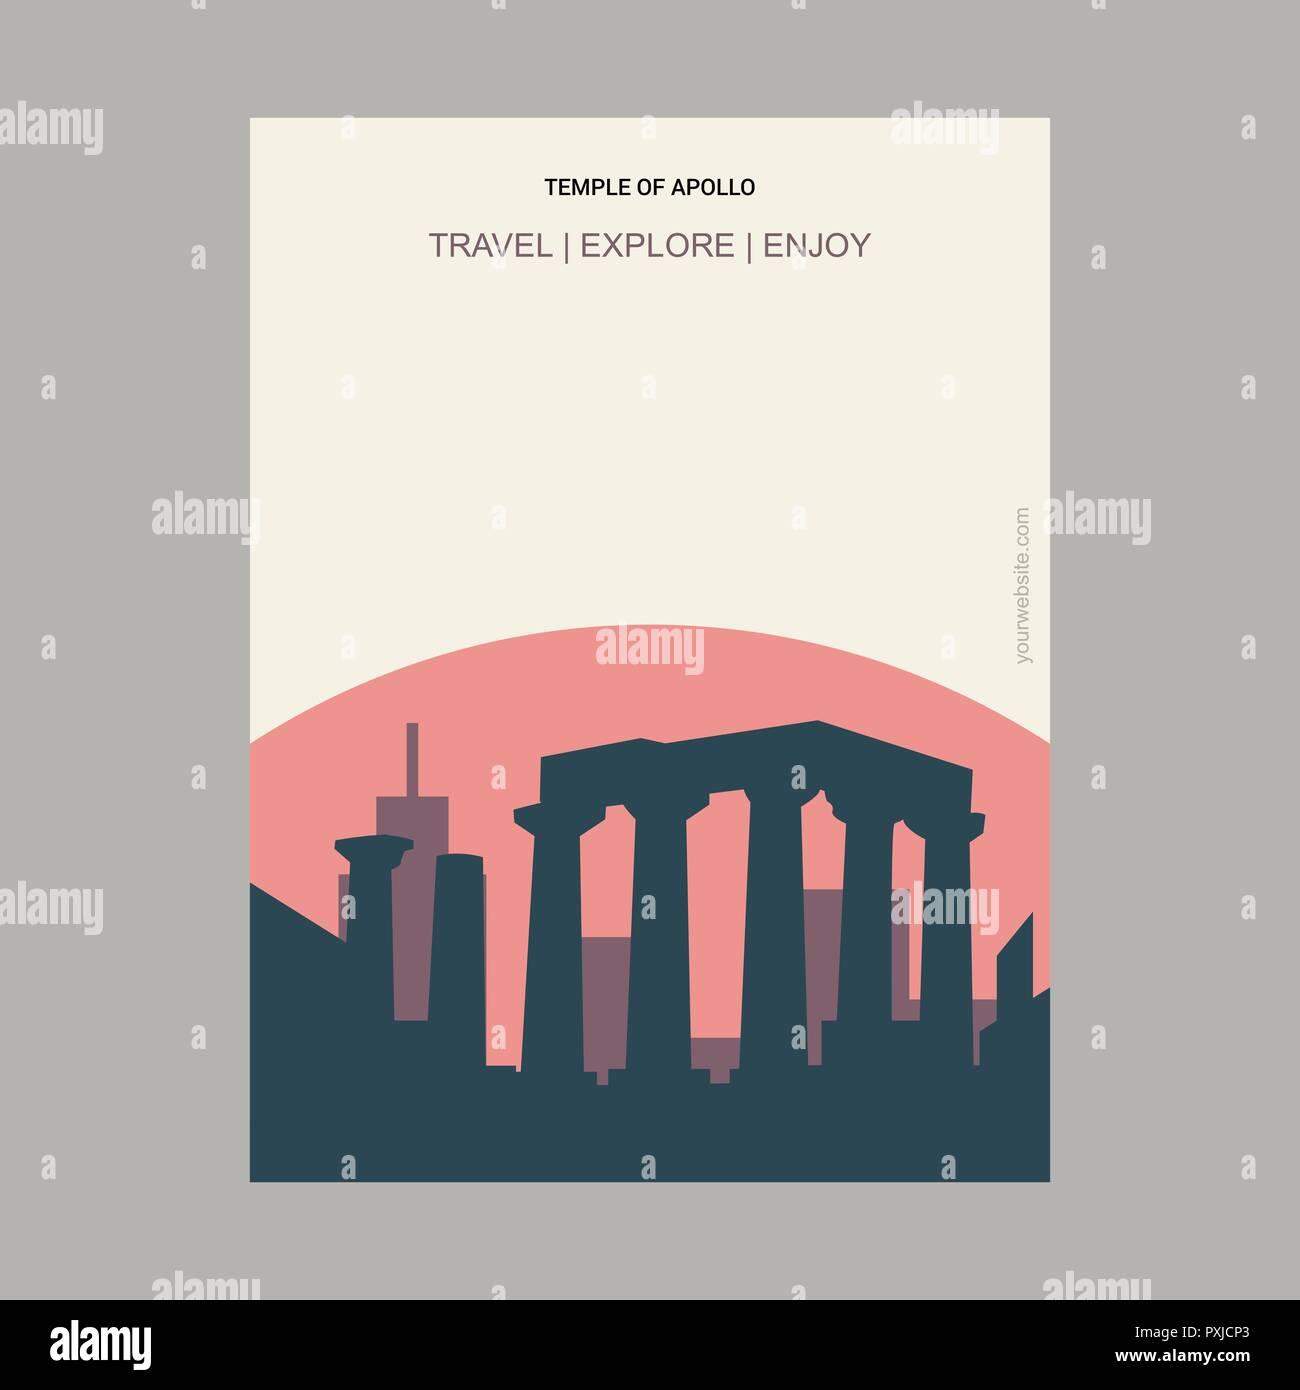 Temple of Apollo Attica, Greece. Vintage Style Landmark Poster Template - Stock Vector